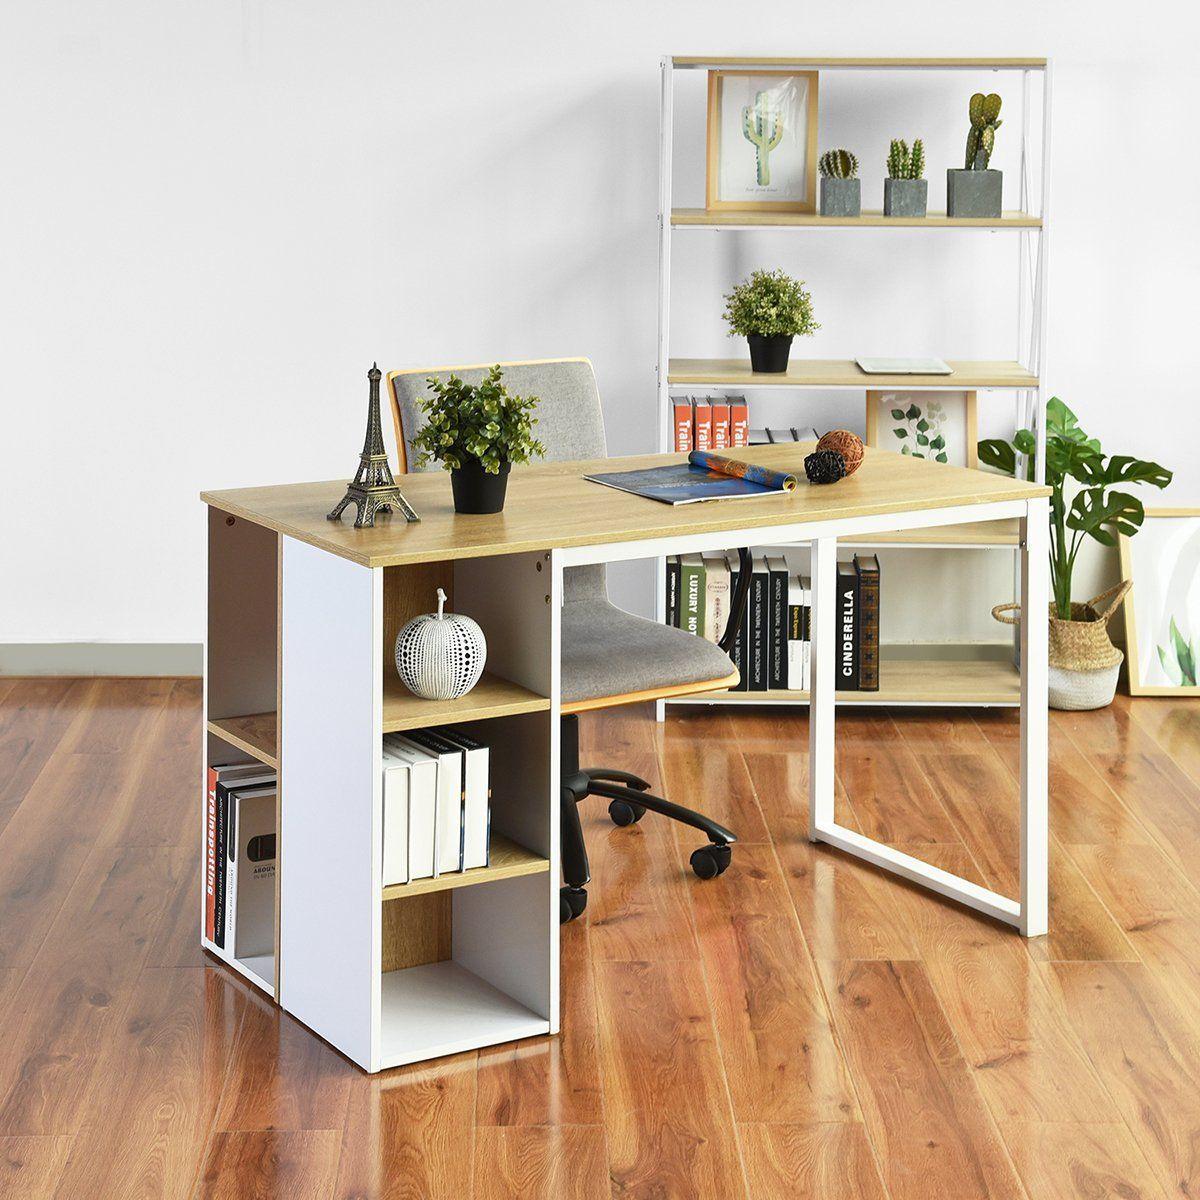 Amazon Com Computer Desk With 5 Side Shelves Organizers Wood Style And Metal Legs Large Size Work Surface Work Office Desk Designs Desk Design Large Work Desk